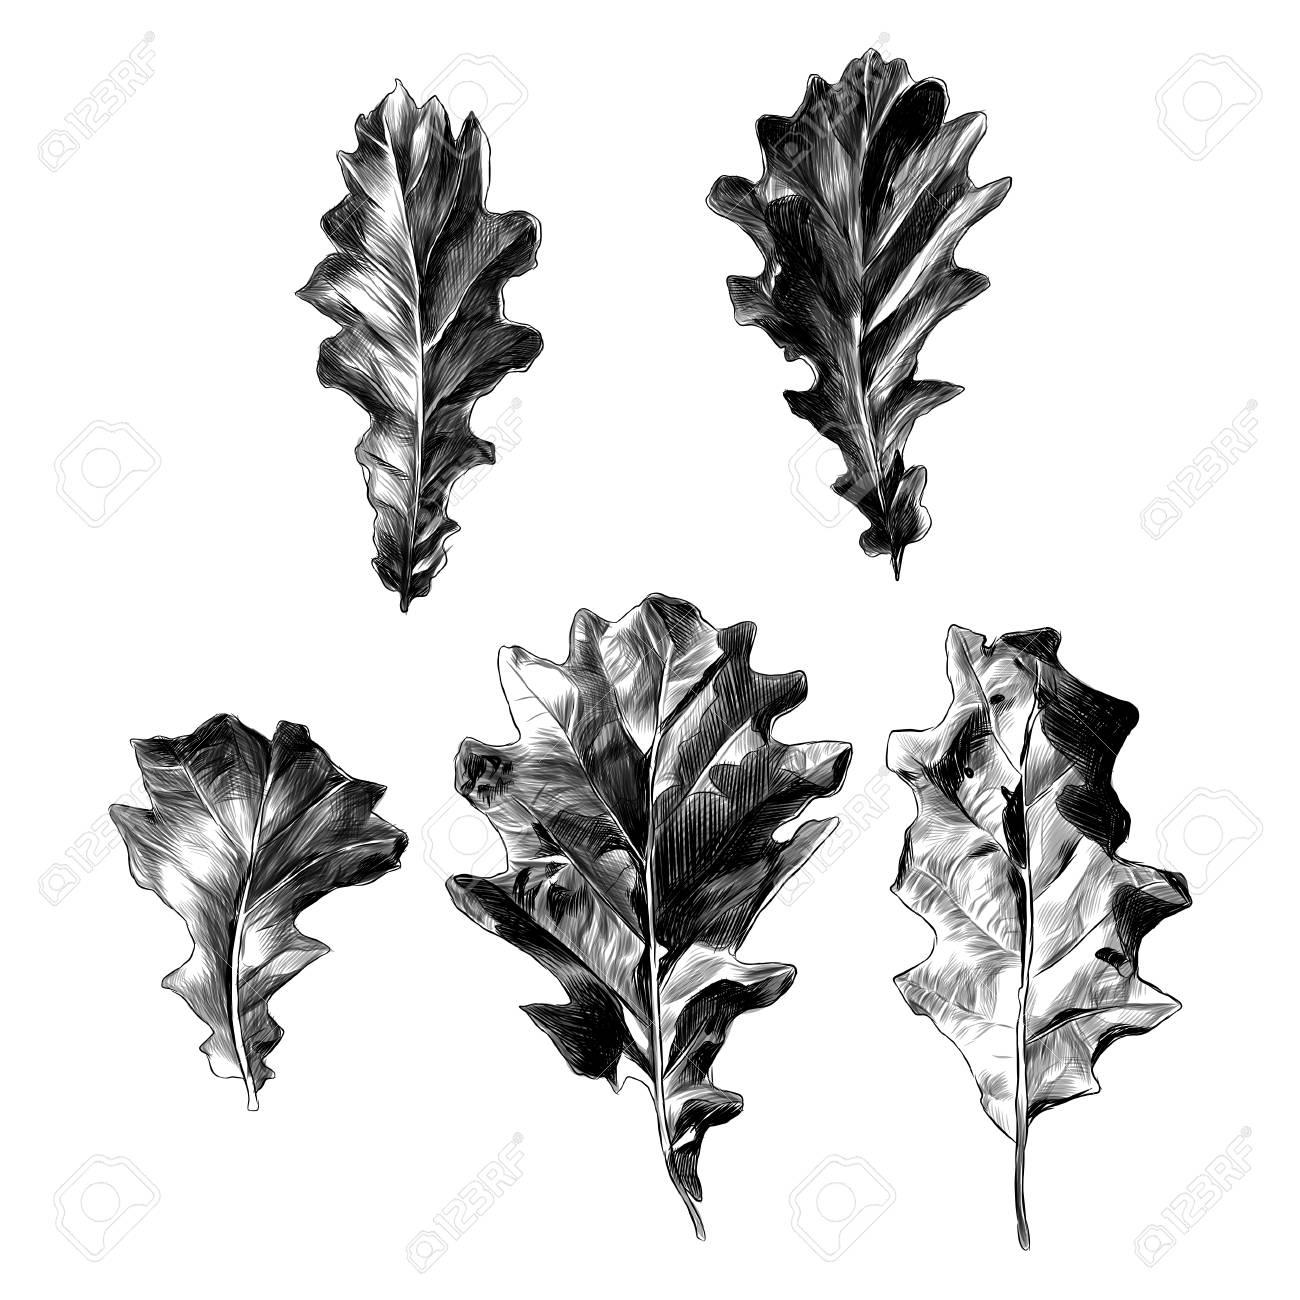 Set Of Oak Leaves Five Elements, Sketch Vector Graphic Monochrome